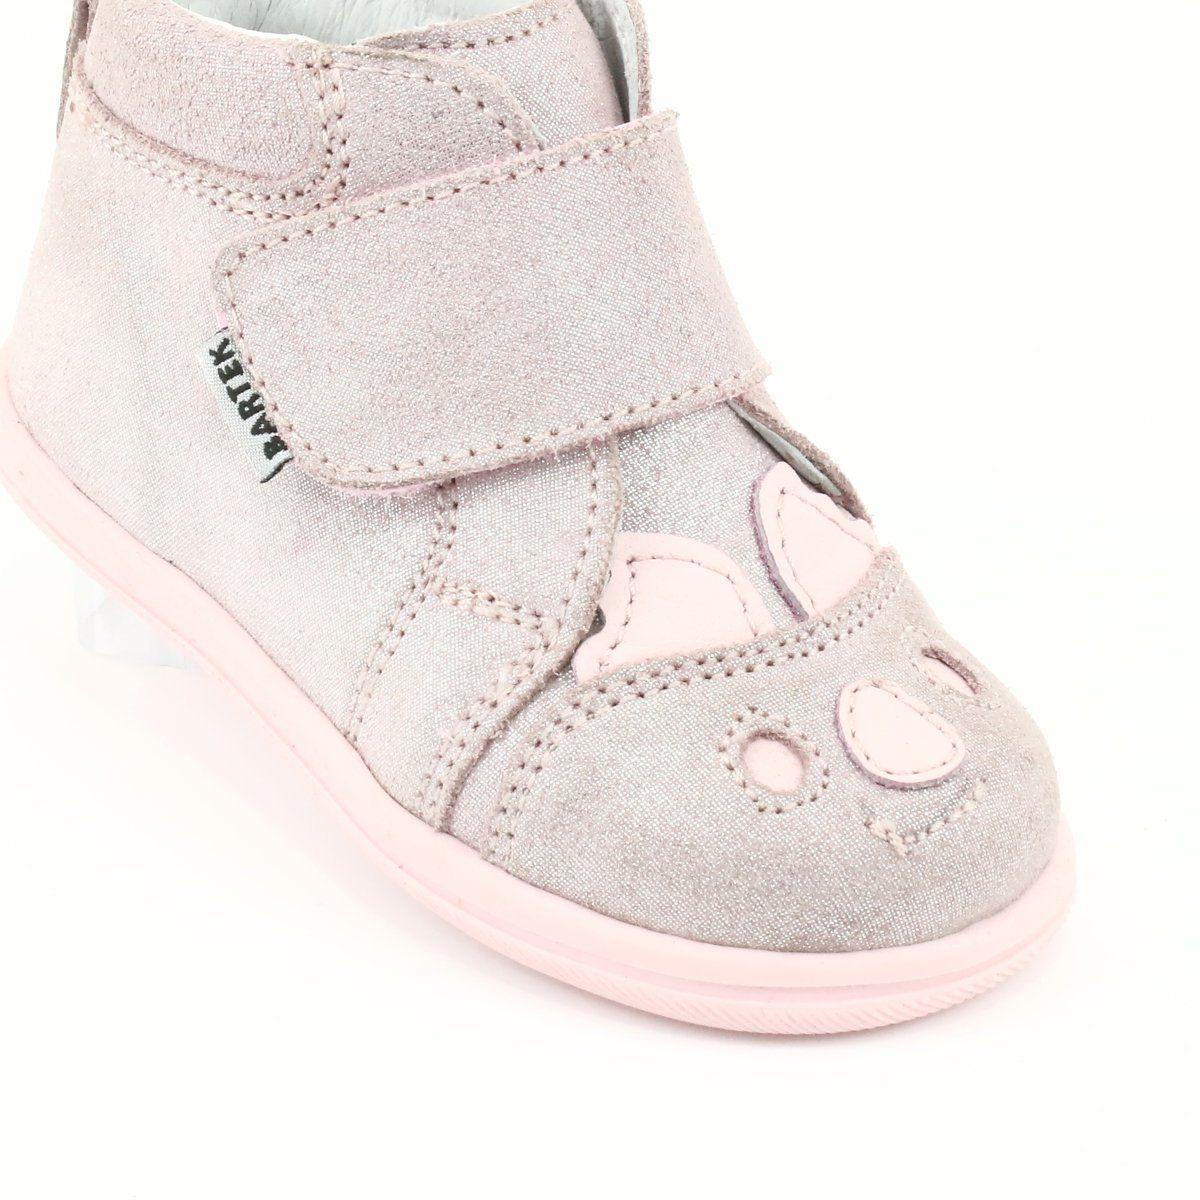 Trzewiki Na Rzepy Koala Bartek 71150 Rozowe Szare High Top Sneakers Wedge Sneaker Shoes